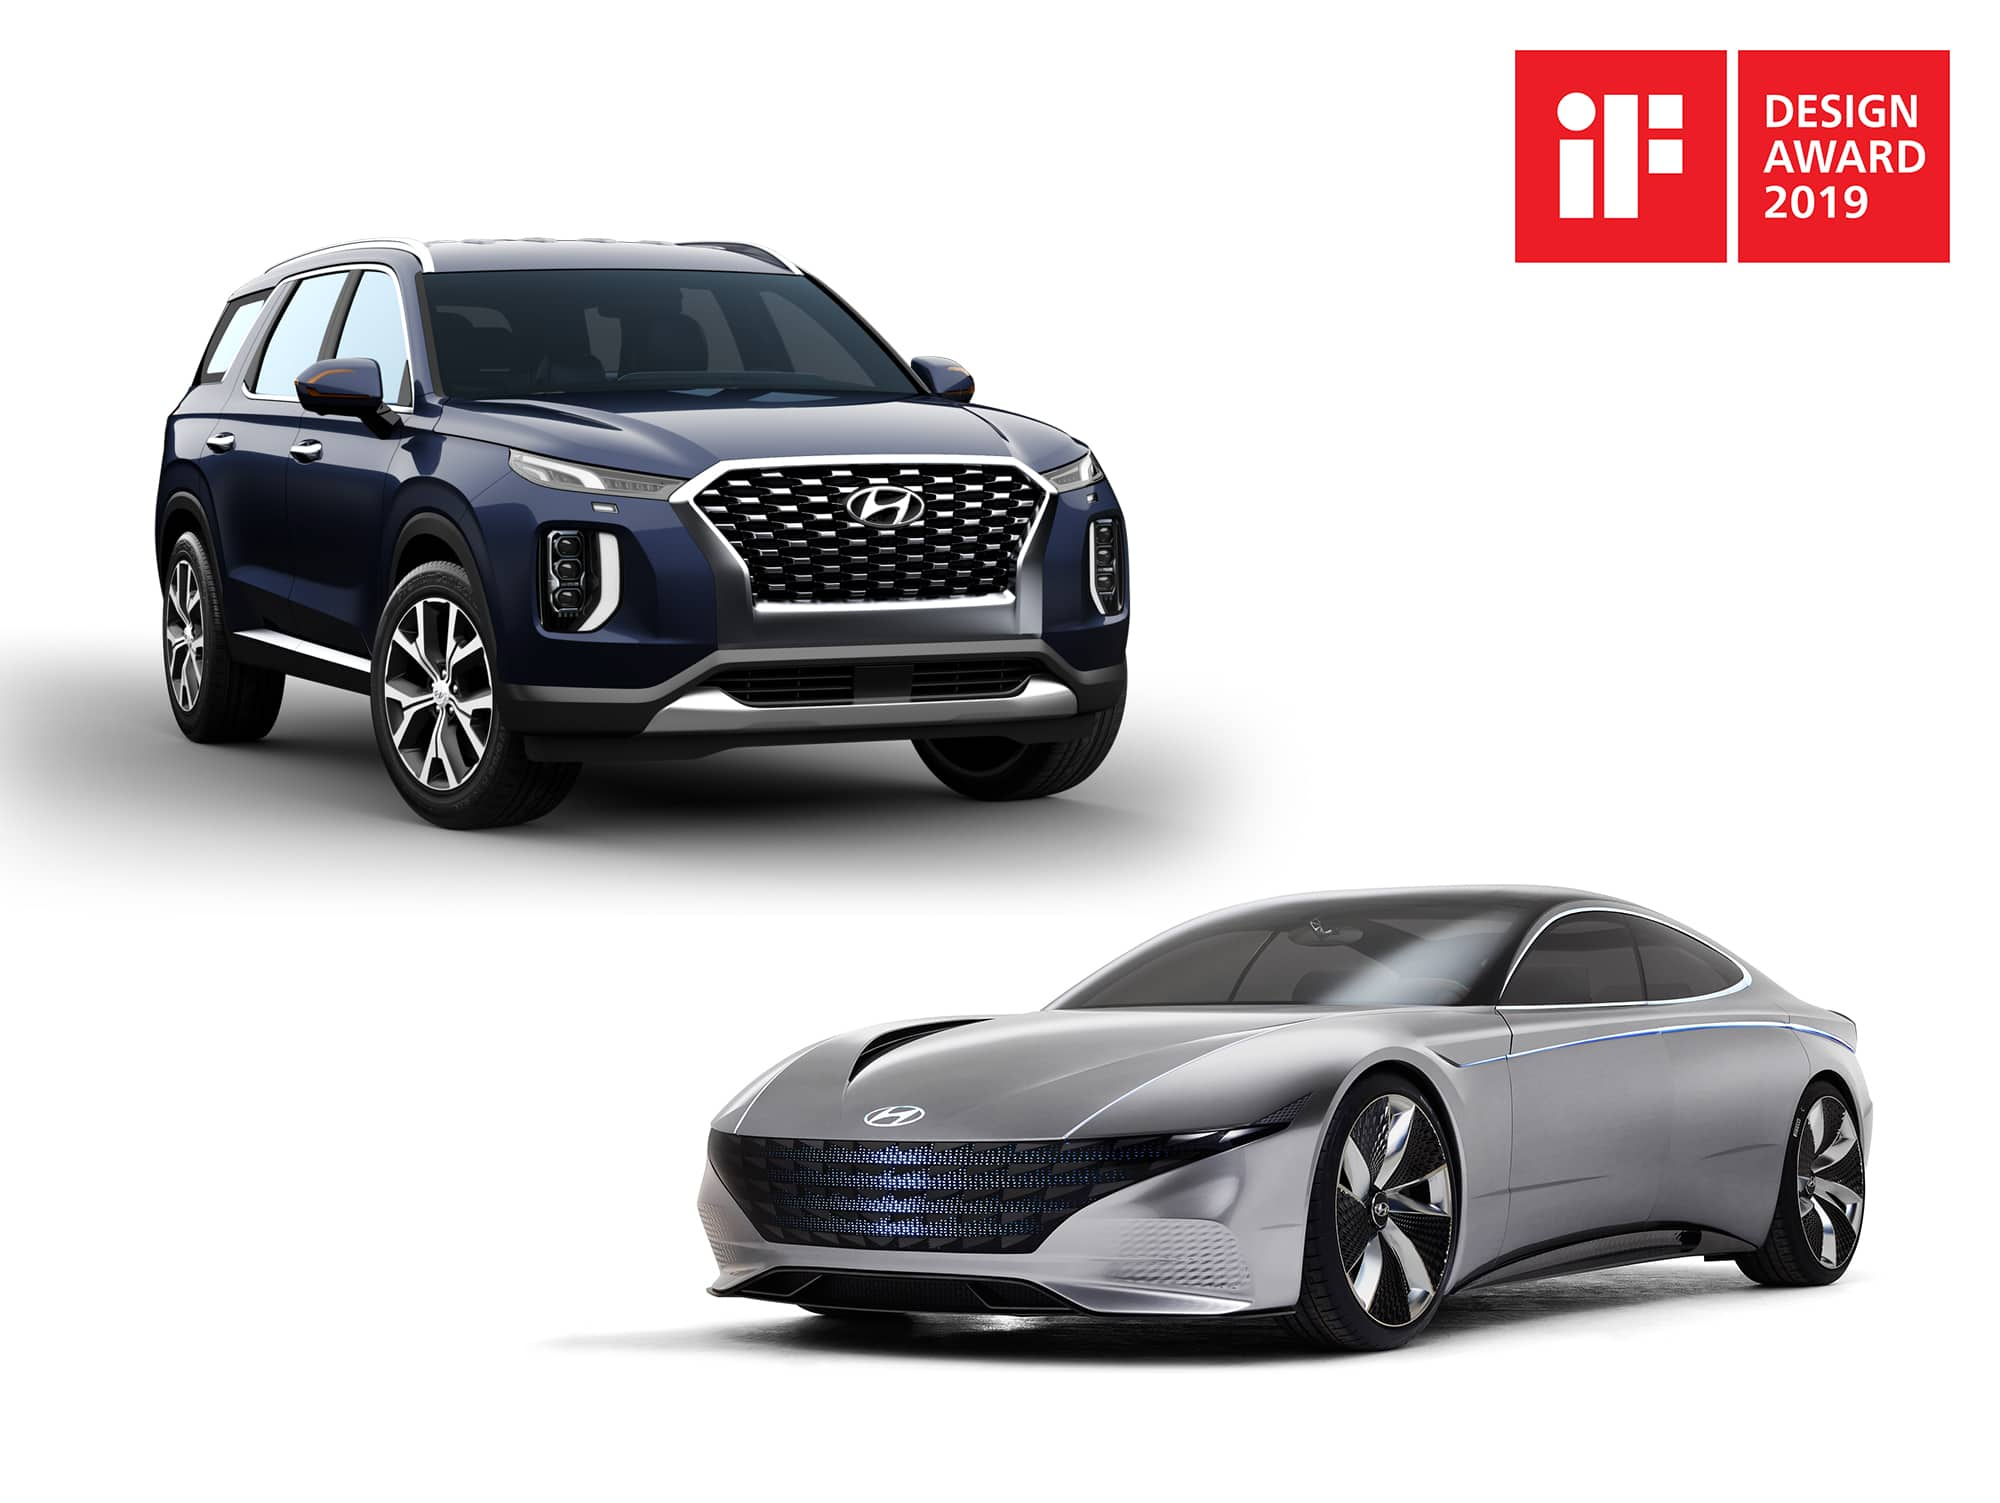 Hyundai Motor Appoints BTS as Global Brand Ambassadors of the All-New Flagship SUV 'Palisade'